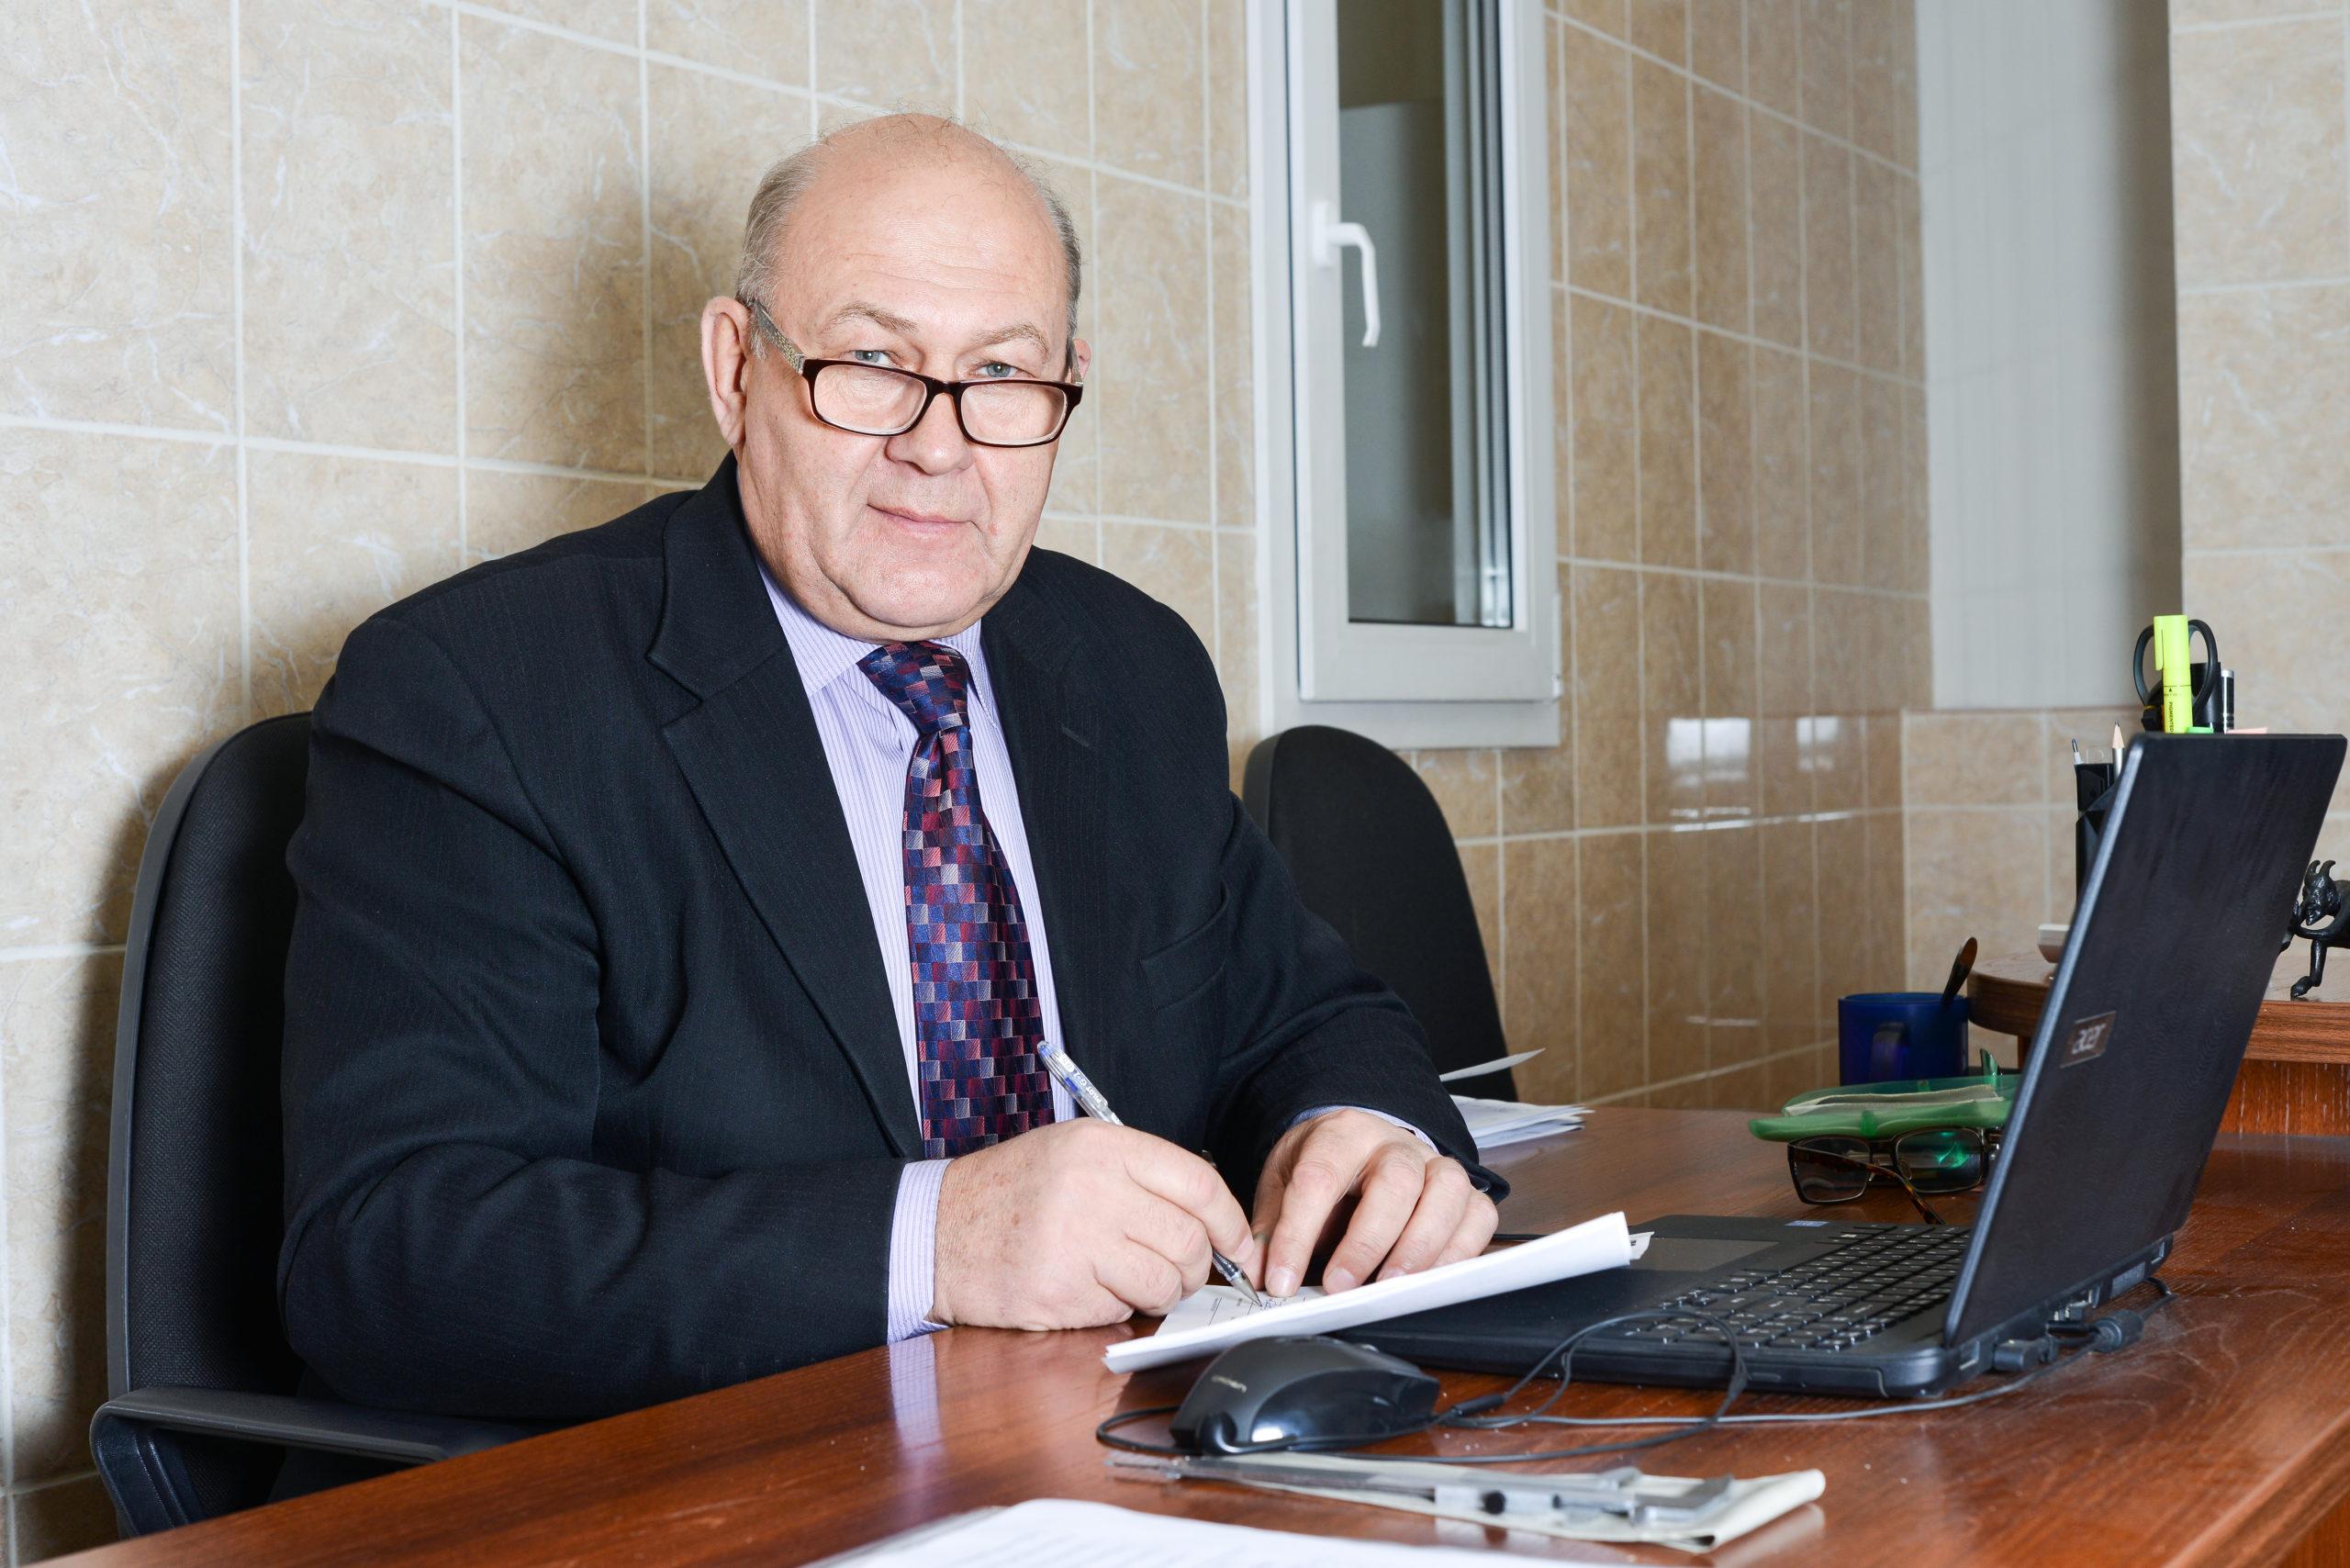 Дроздов Виктор Михайлович (Начальник лаборатории)